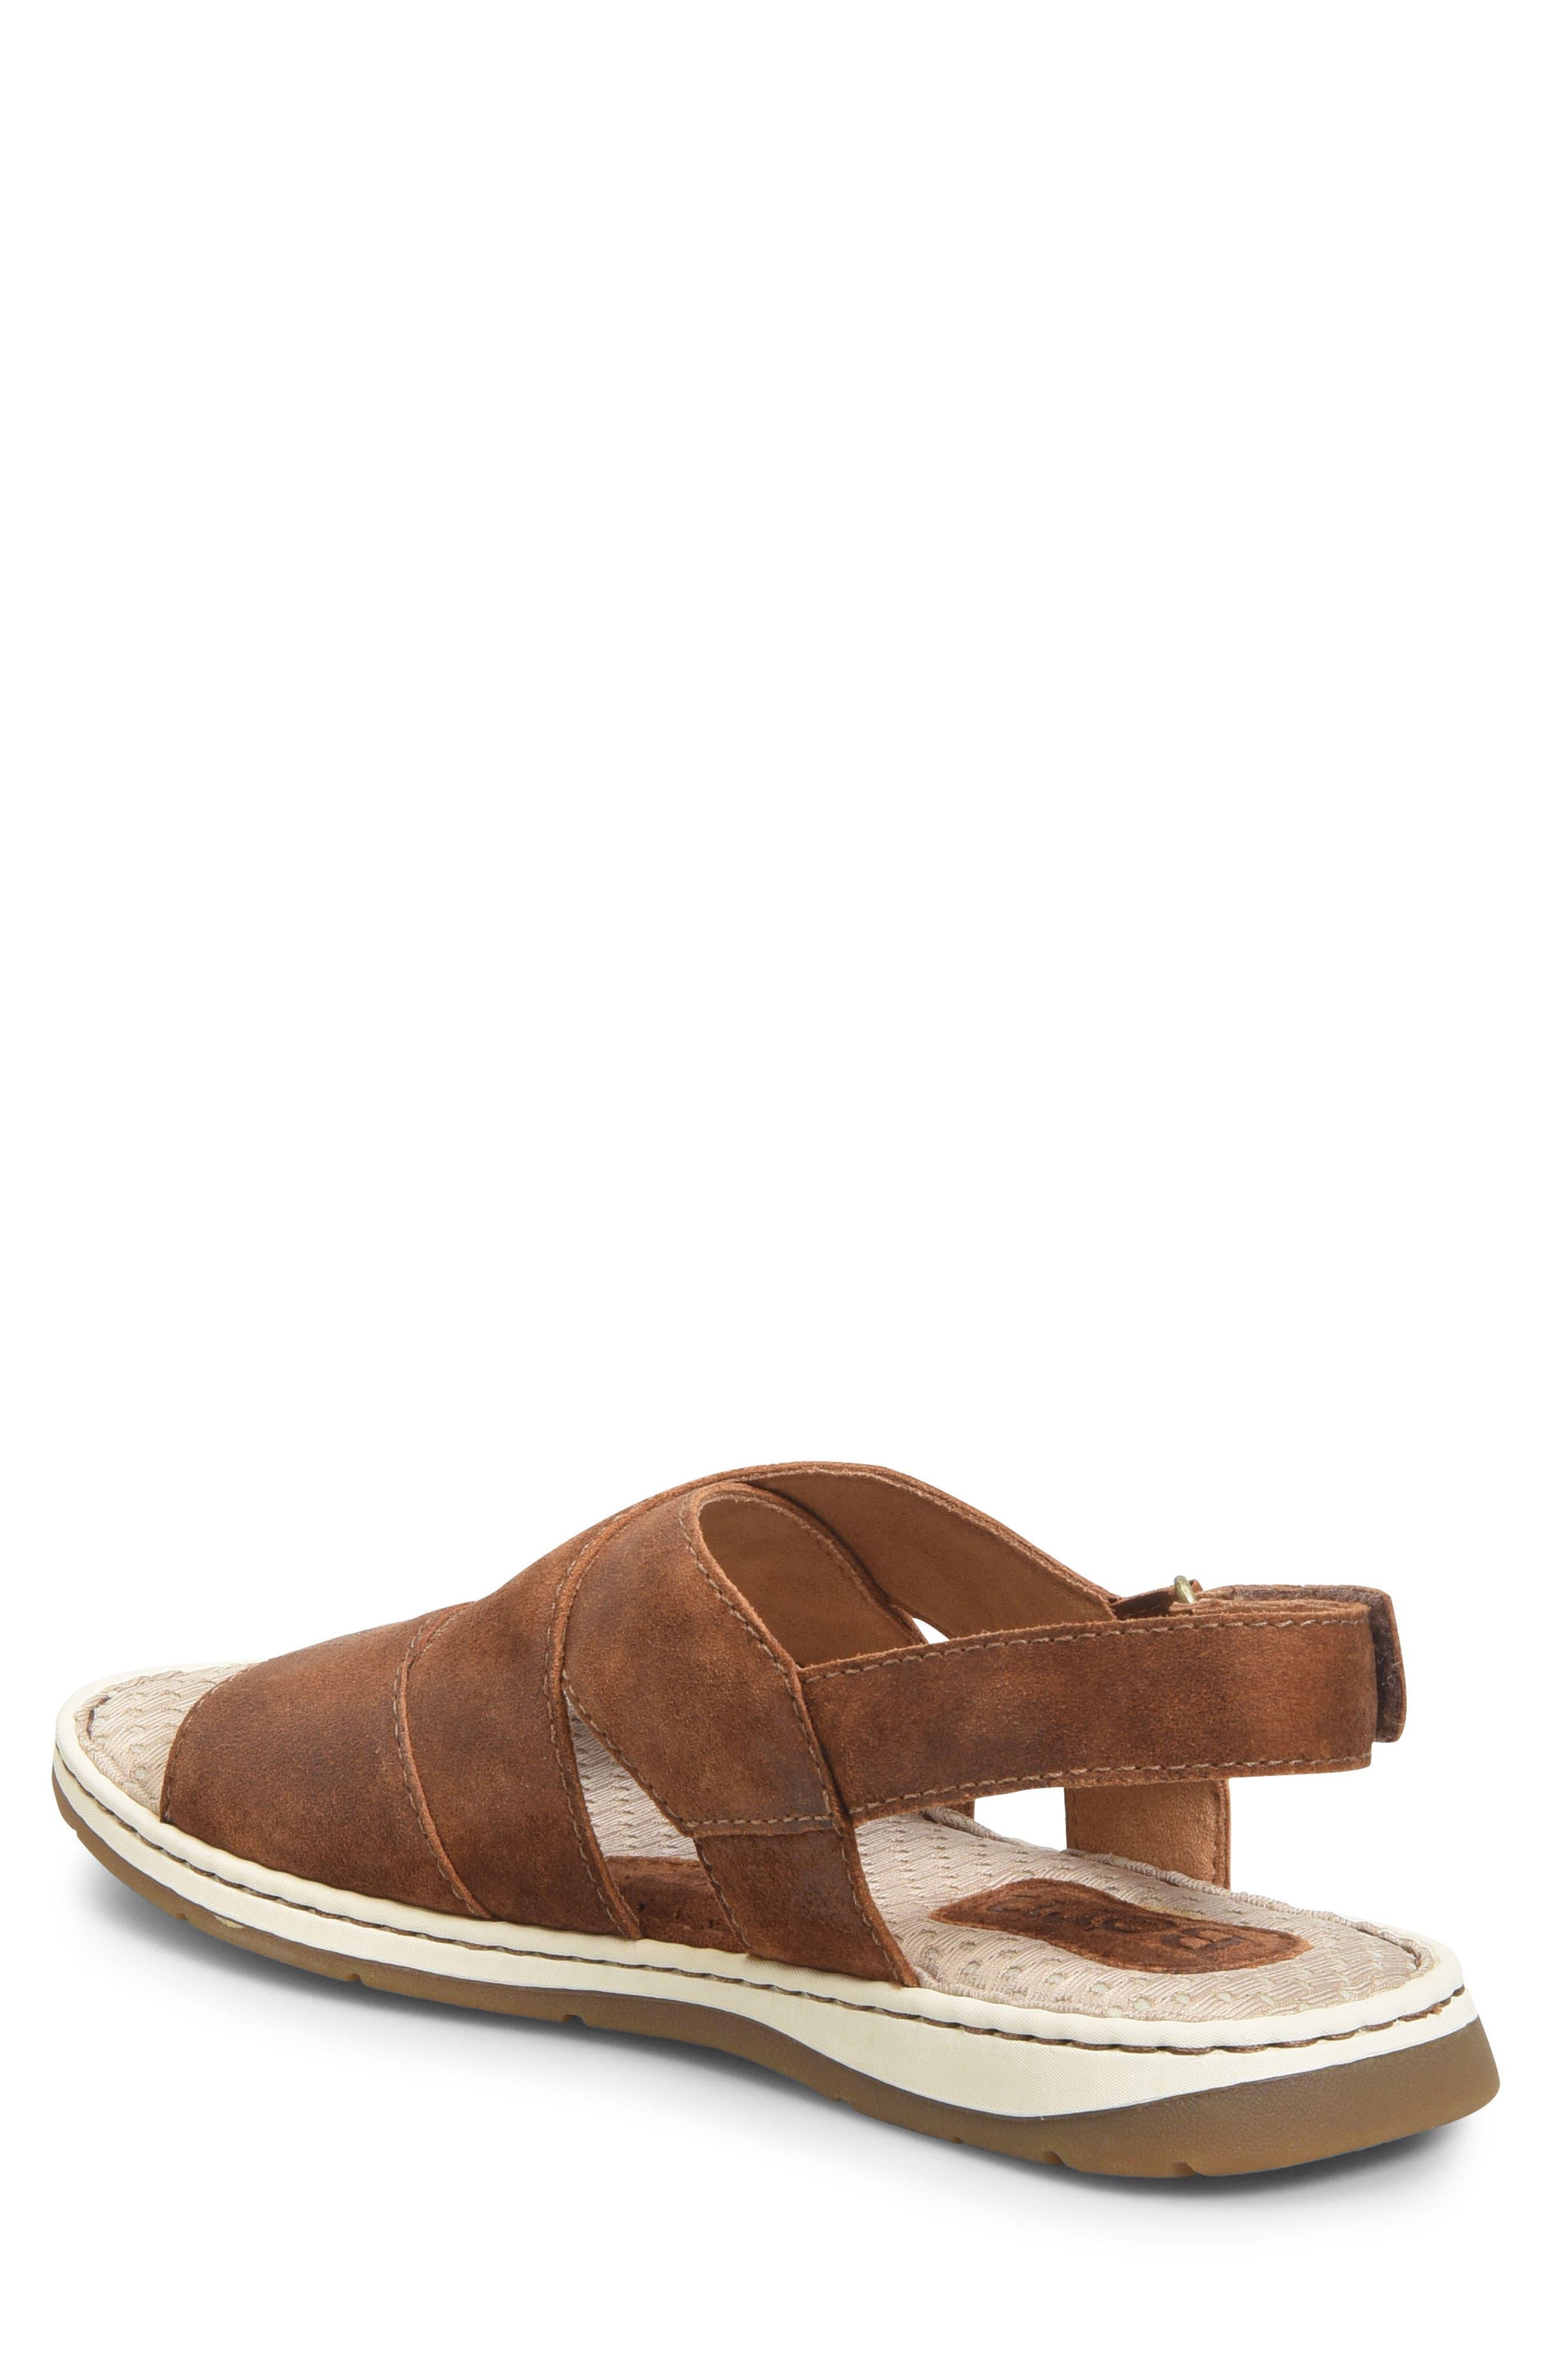 Shell Cross Strap Sandal,                             Alternate thumbnail 2, color,                             Rust Leather